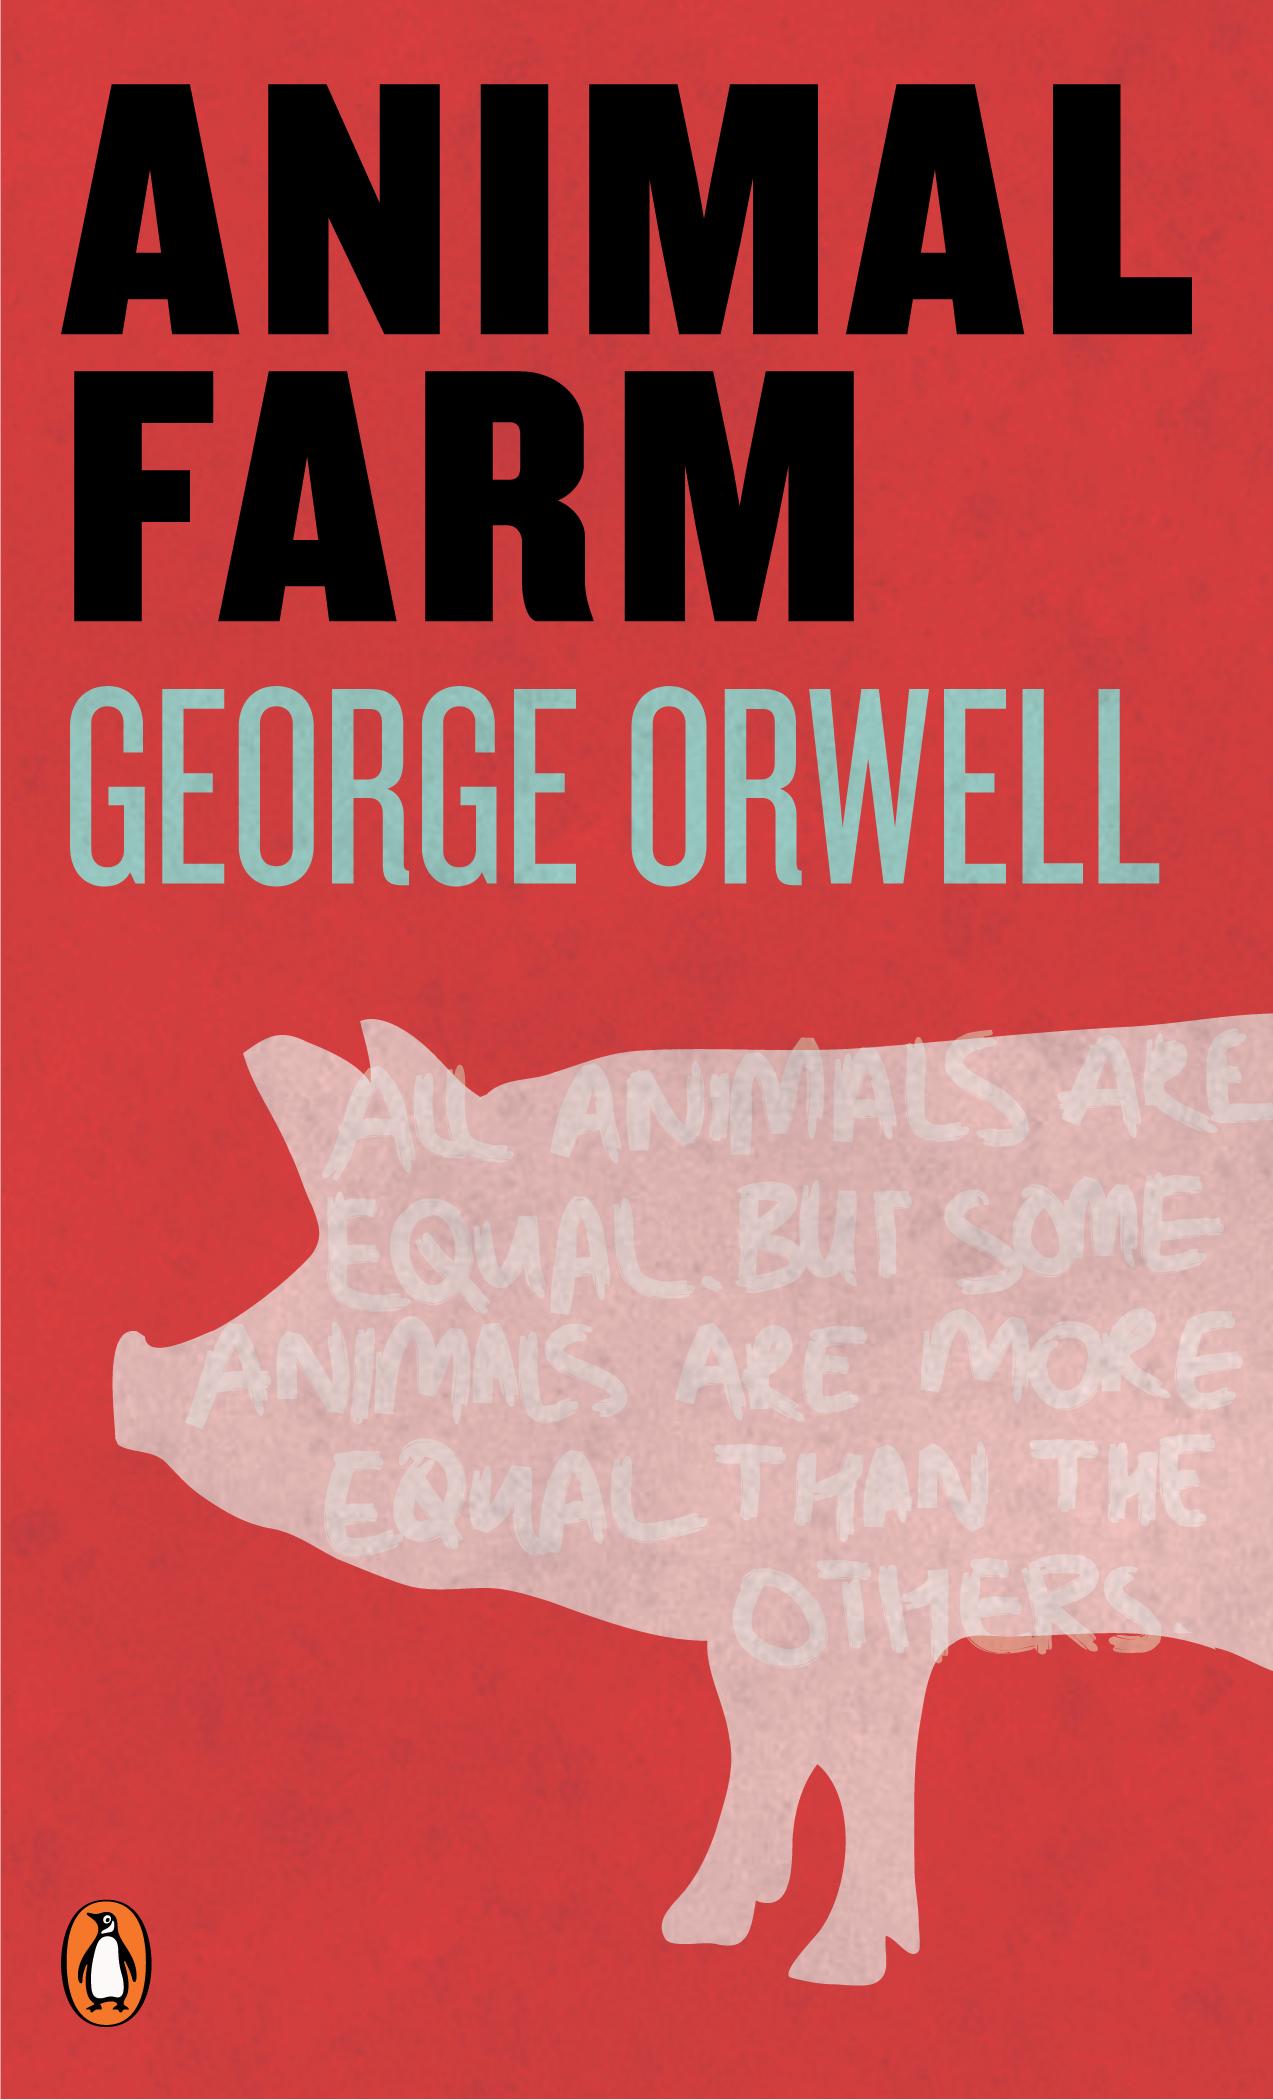 animal_farm_cover2014.jpg